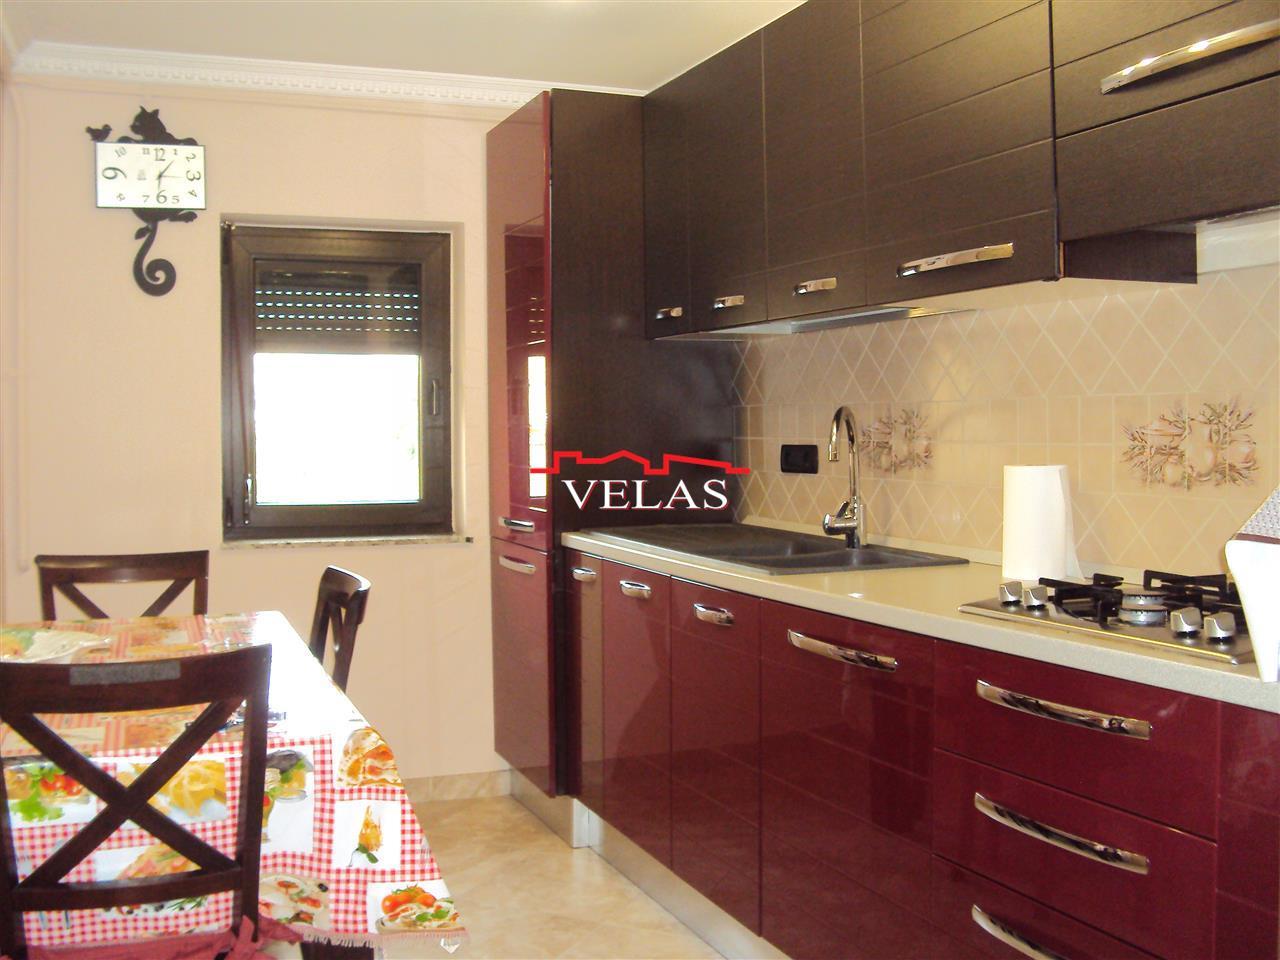 Inchiriez apartament 3 camere, mobilat si utilat, CT, central